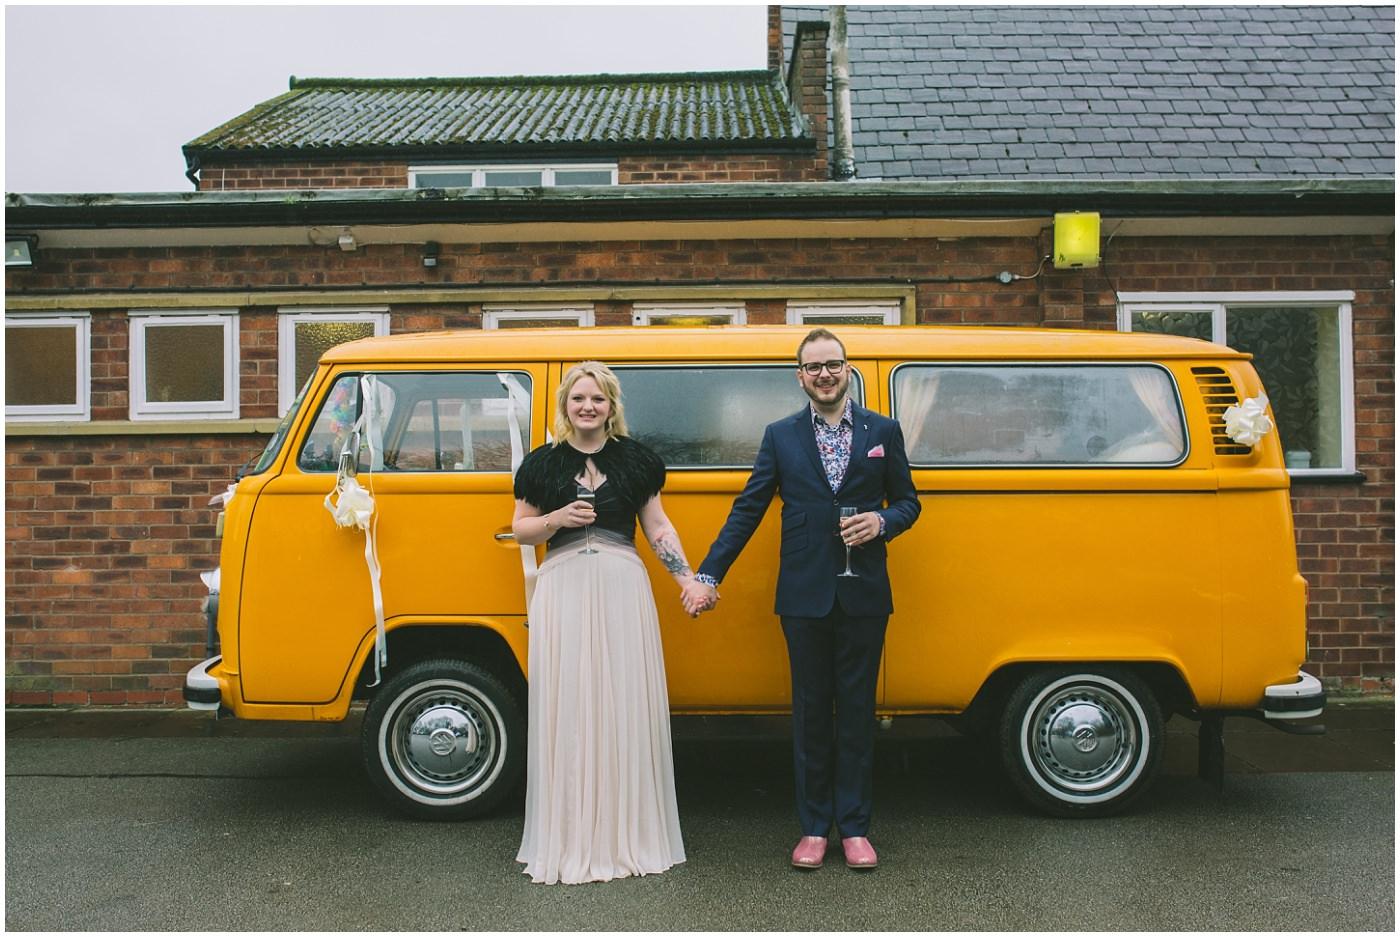 Couple stand holding hands in front of orange camper van